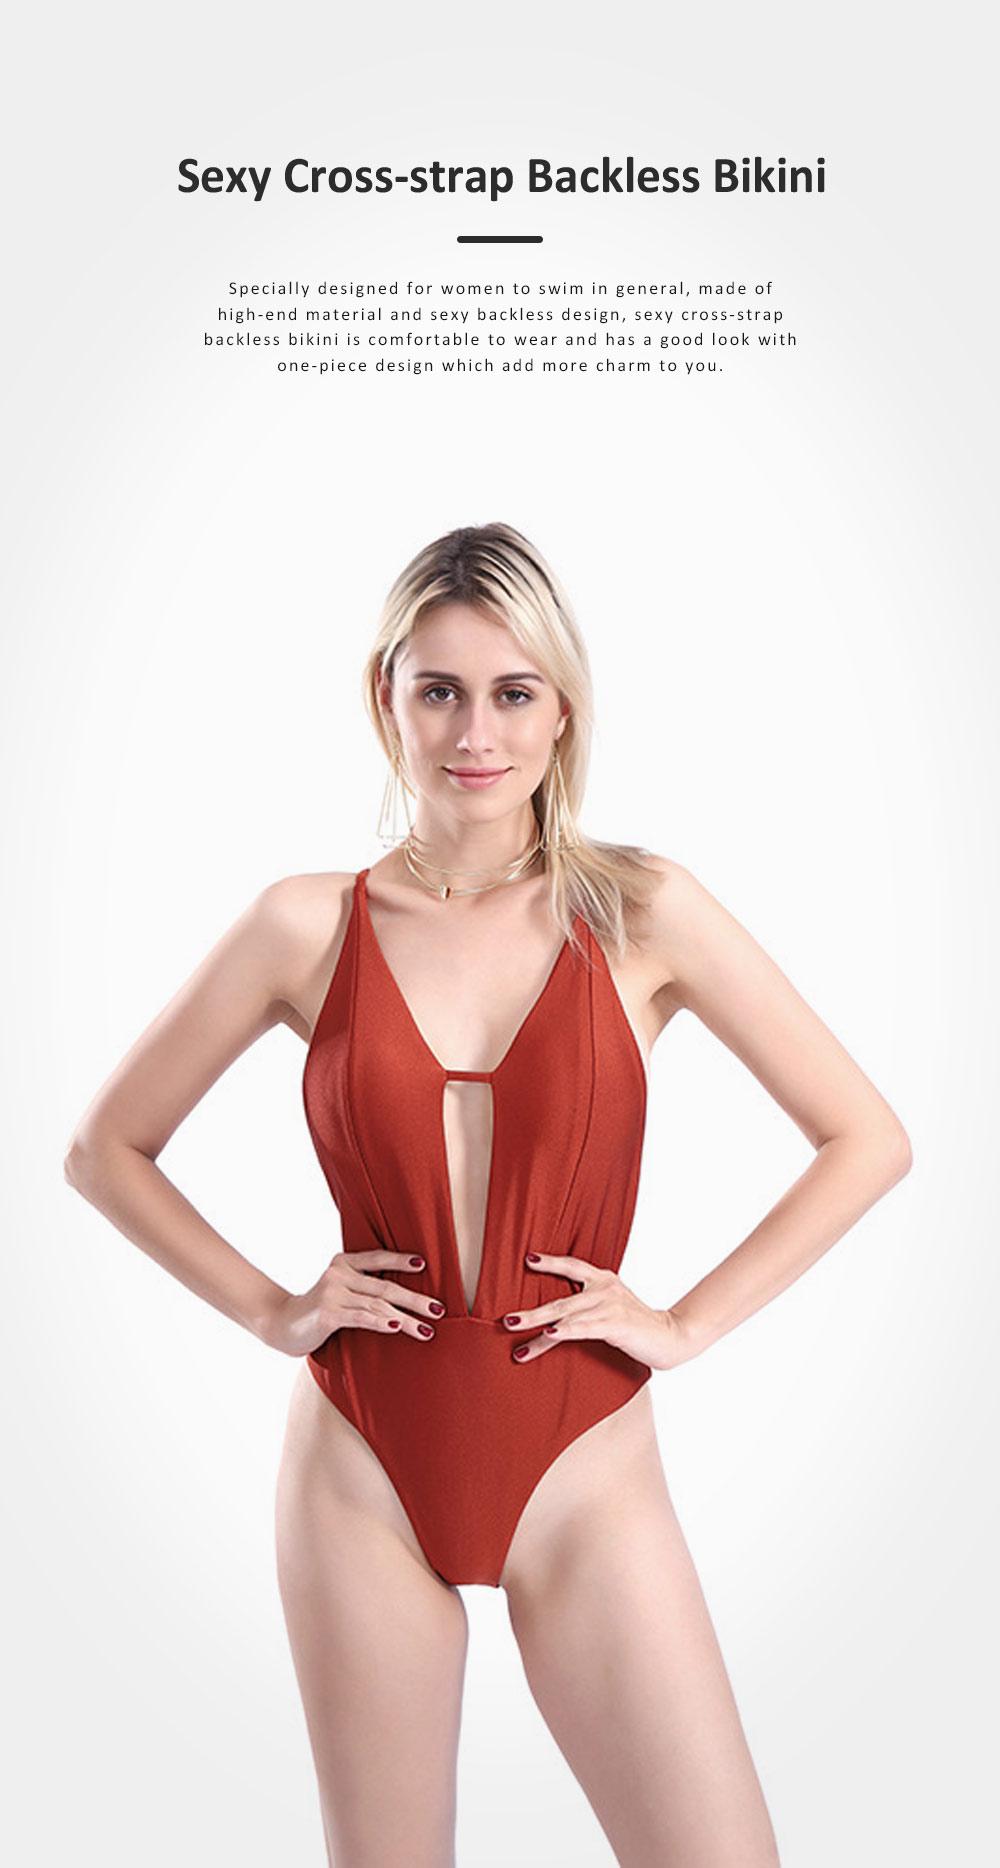 2019 Sexy Cross-strap Backless Bikini for Women , One-piece High Waist Swimwear Adjustable Shoulder Strap Backless Swimming Suit Bikini Red 0